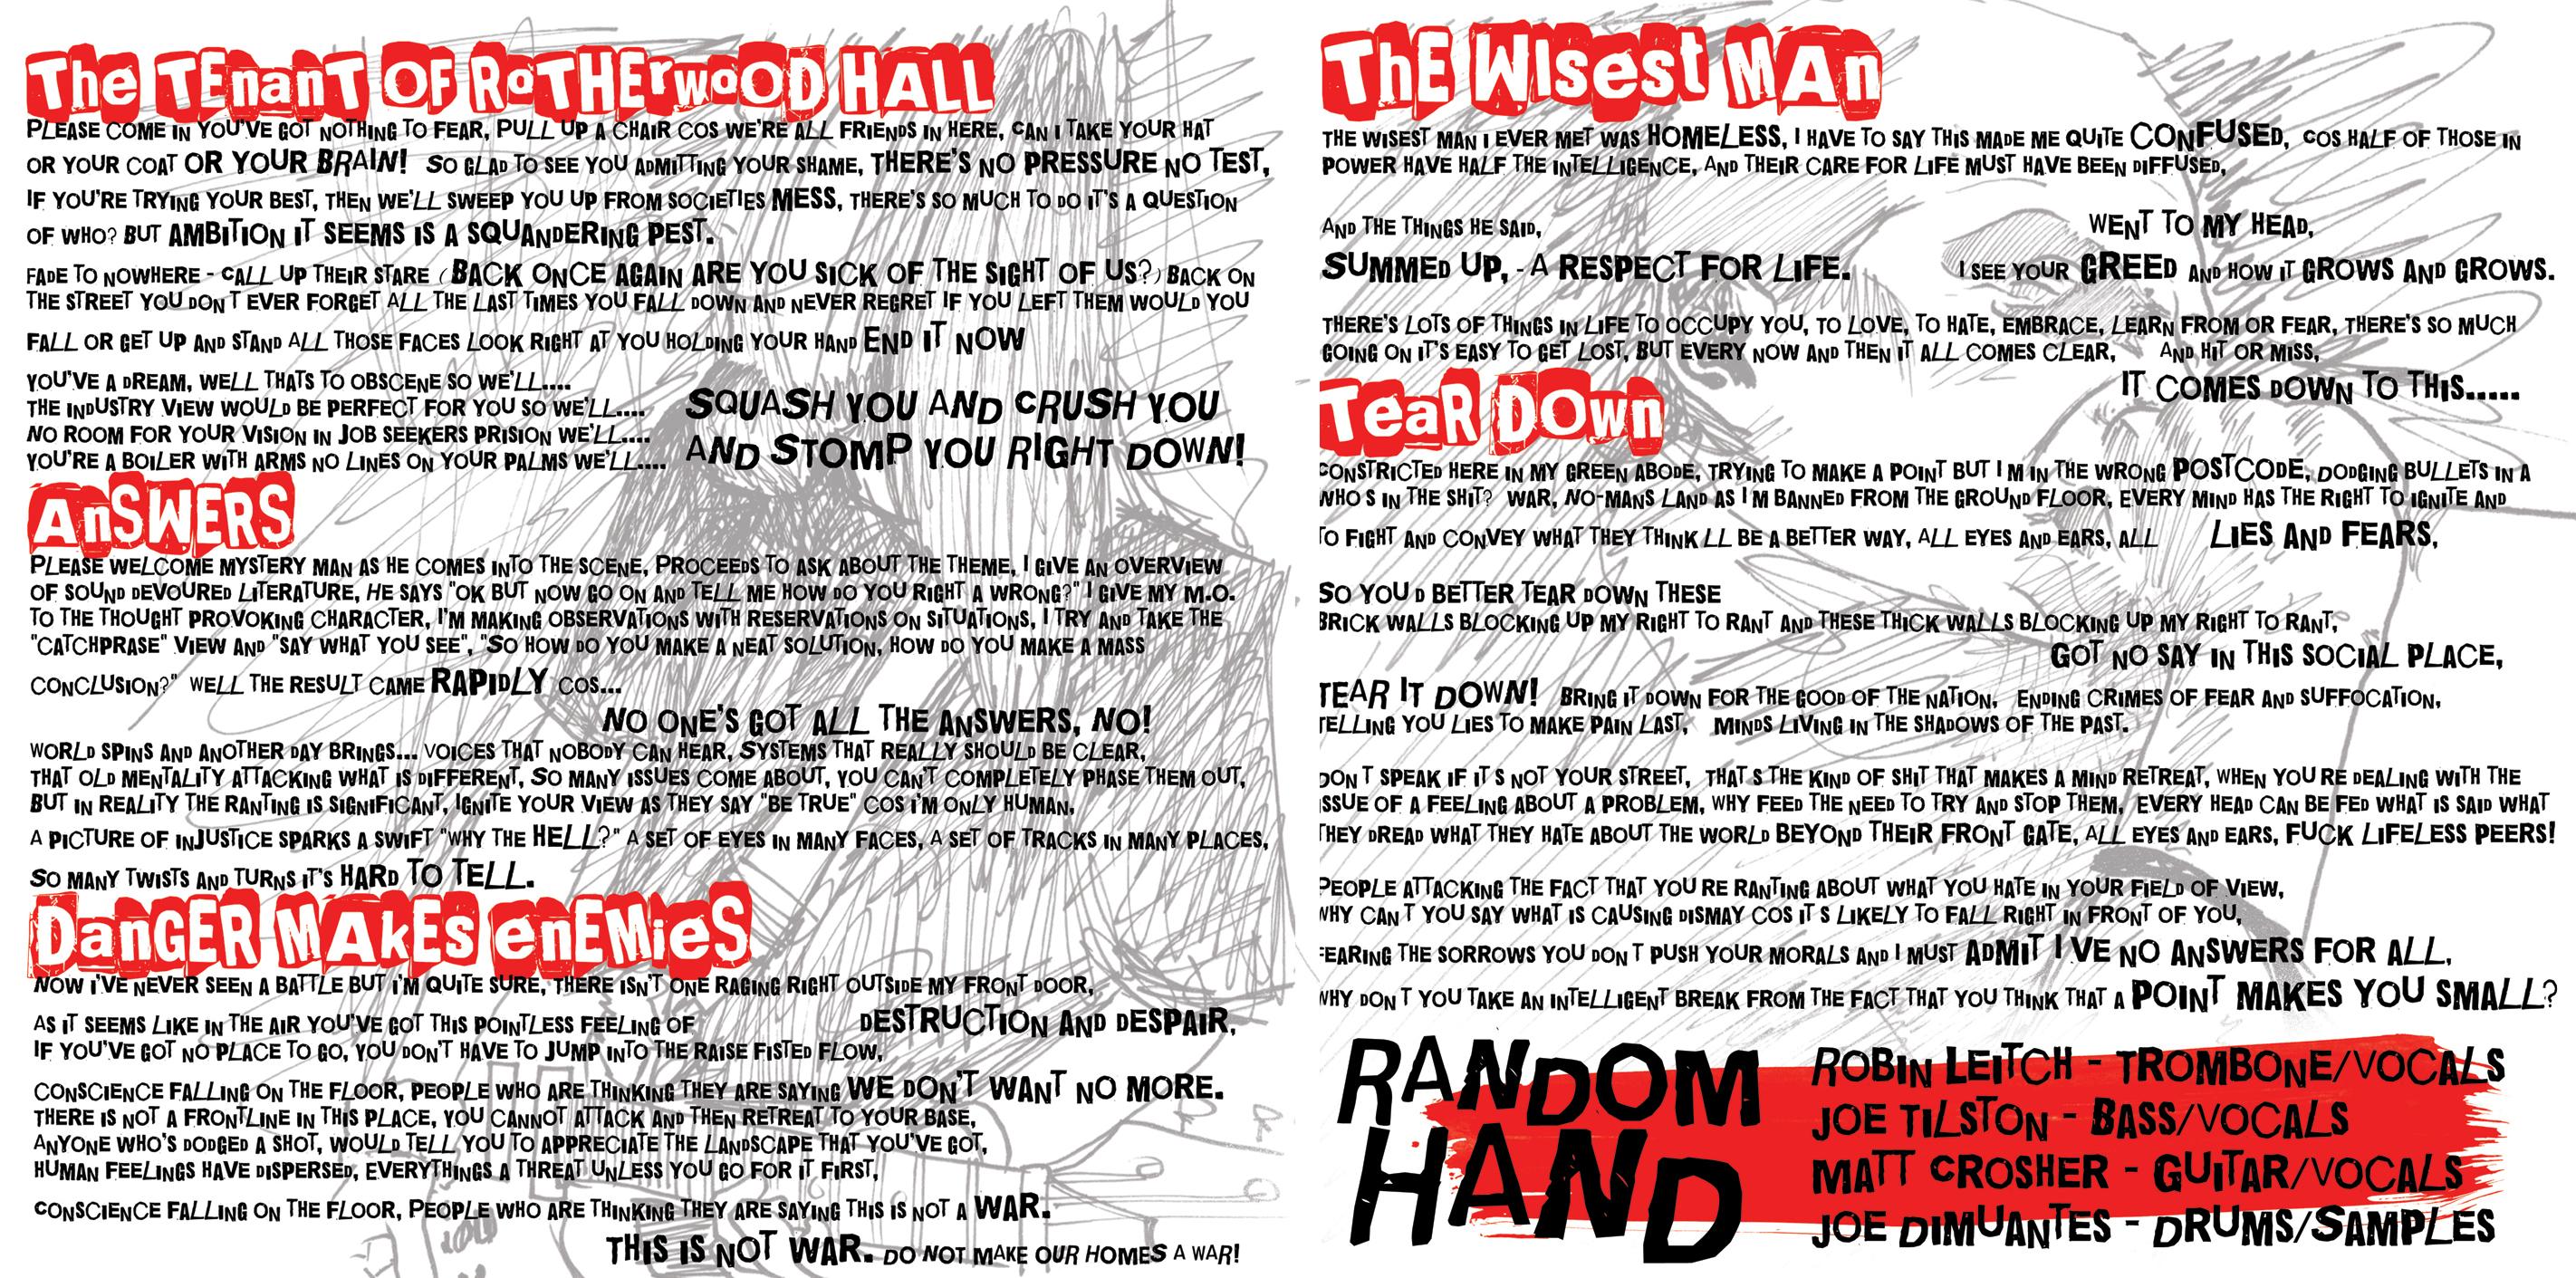 Random Hand - Another Change Of Plan CD     - Bomber Music